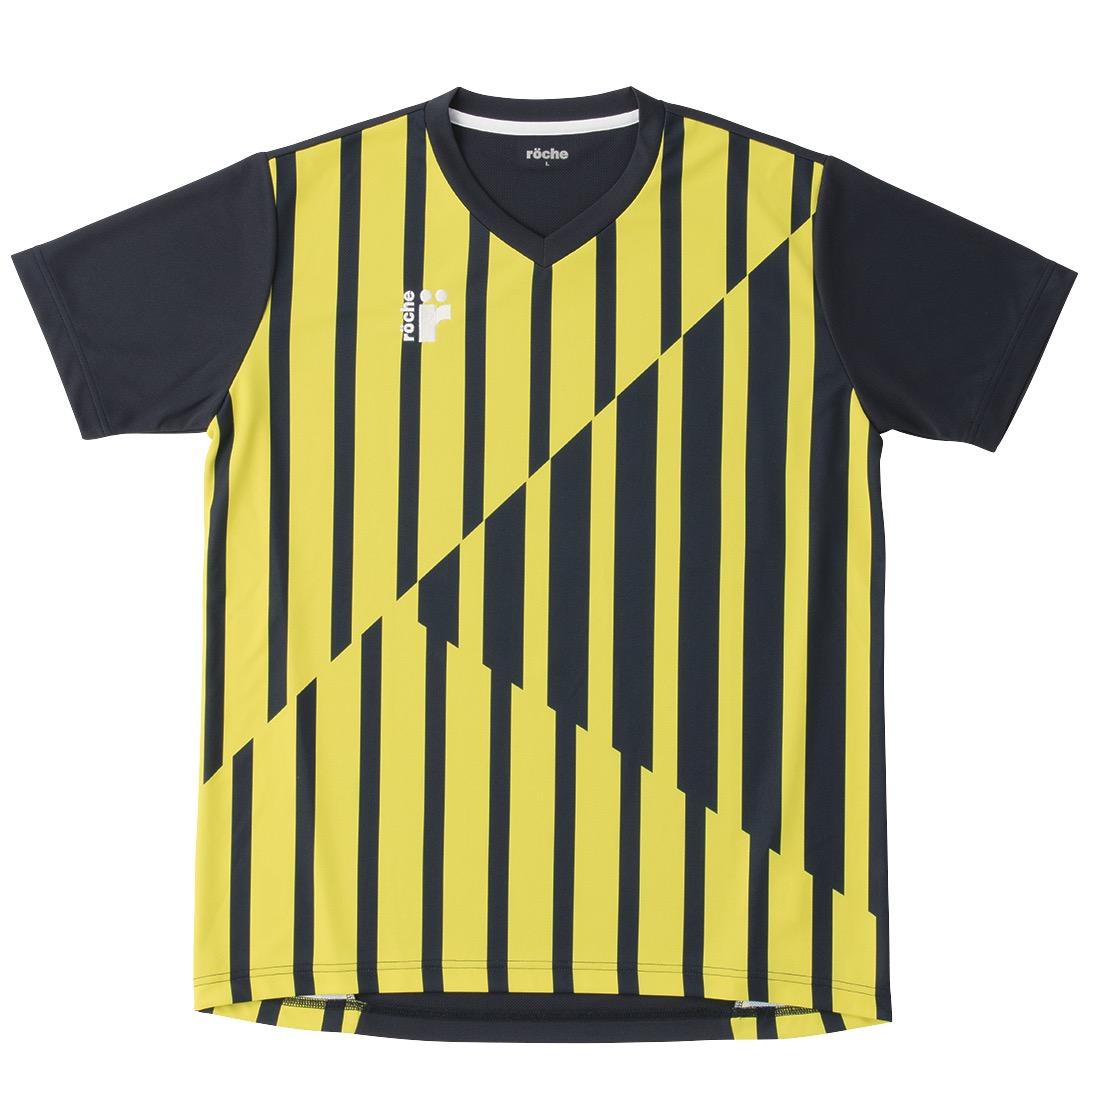 <small>R9S06V<br>メンズゲームシャツ</small>